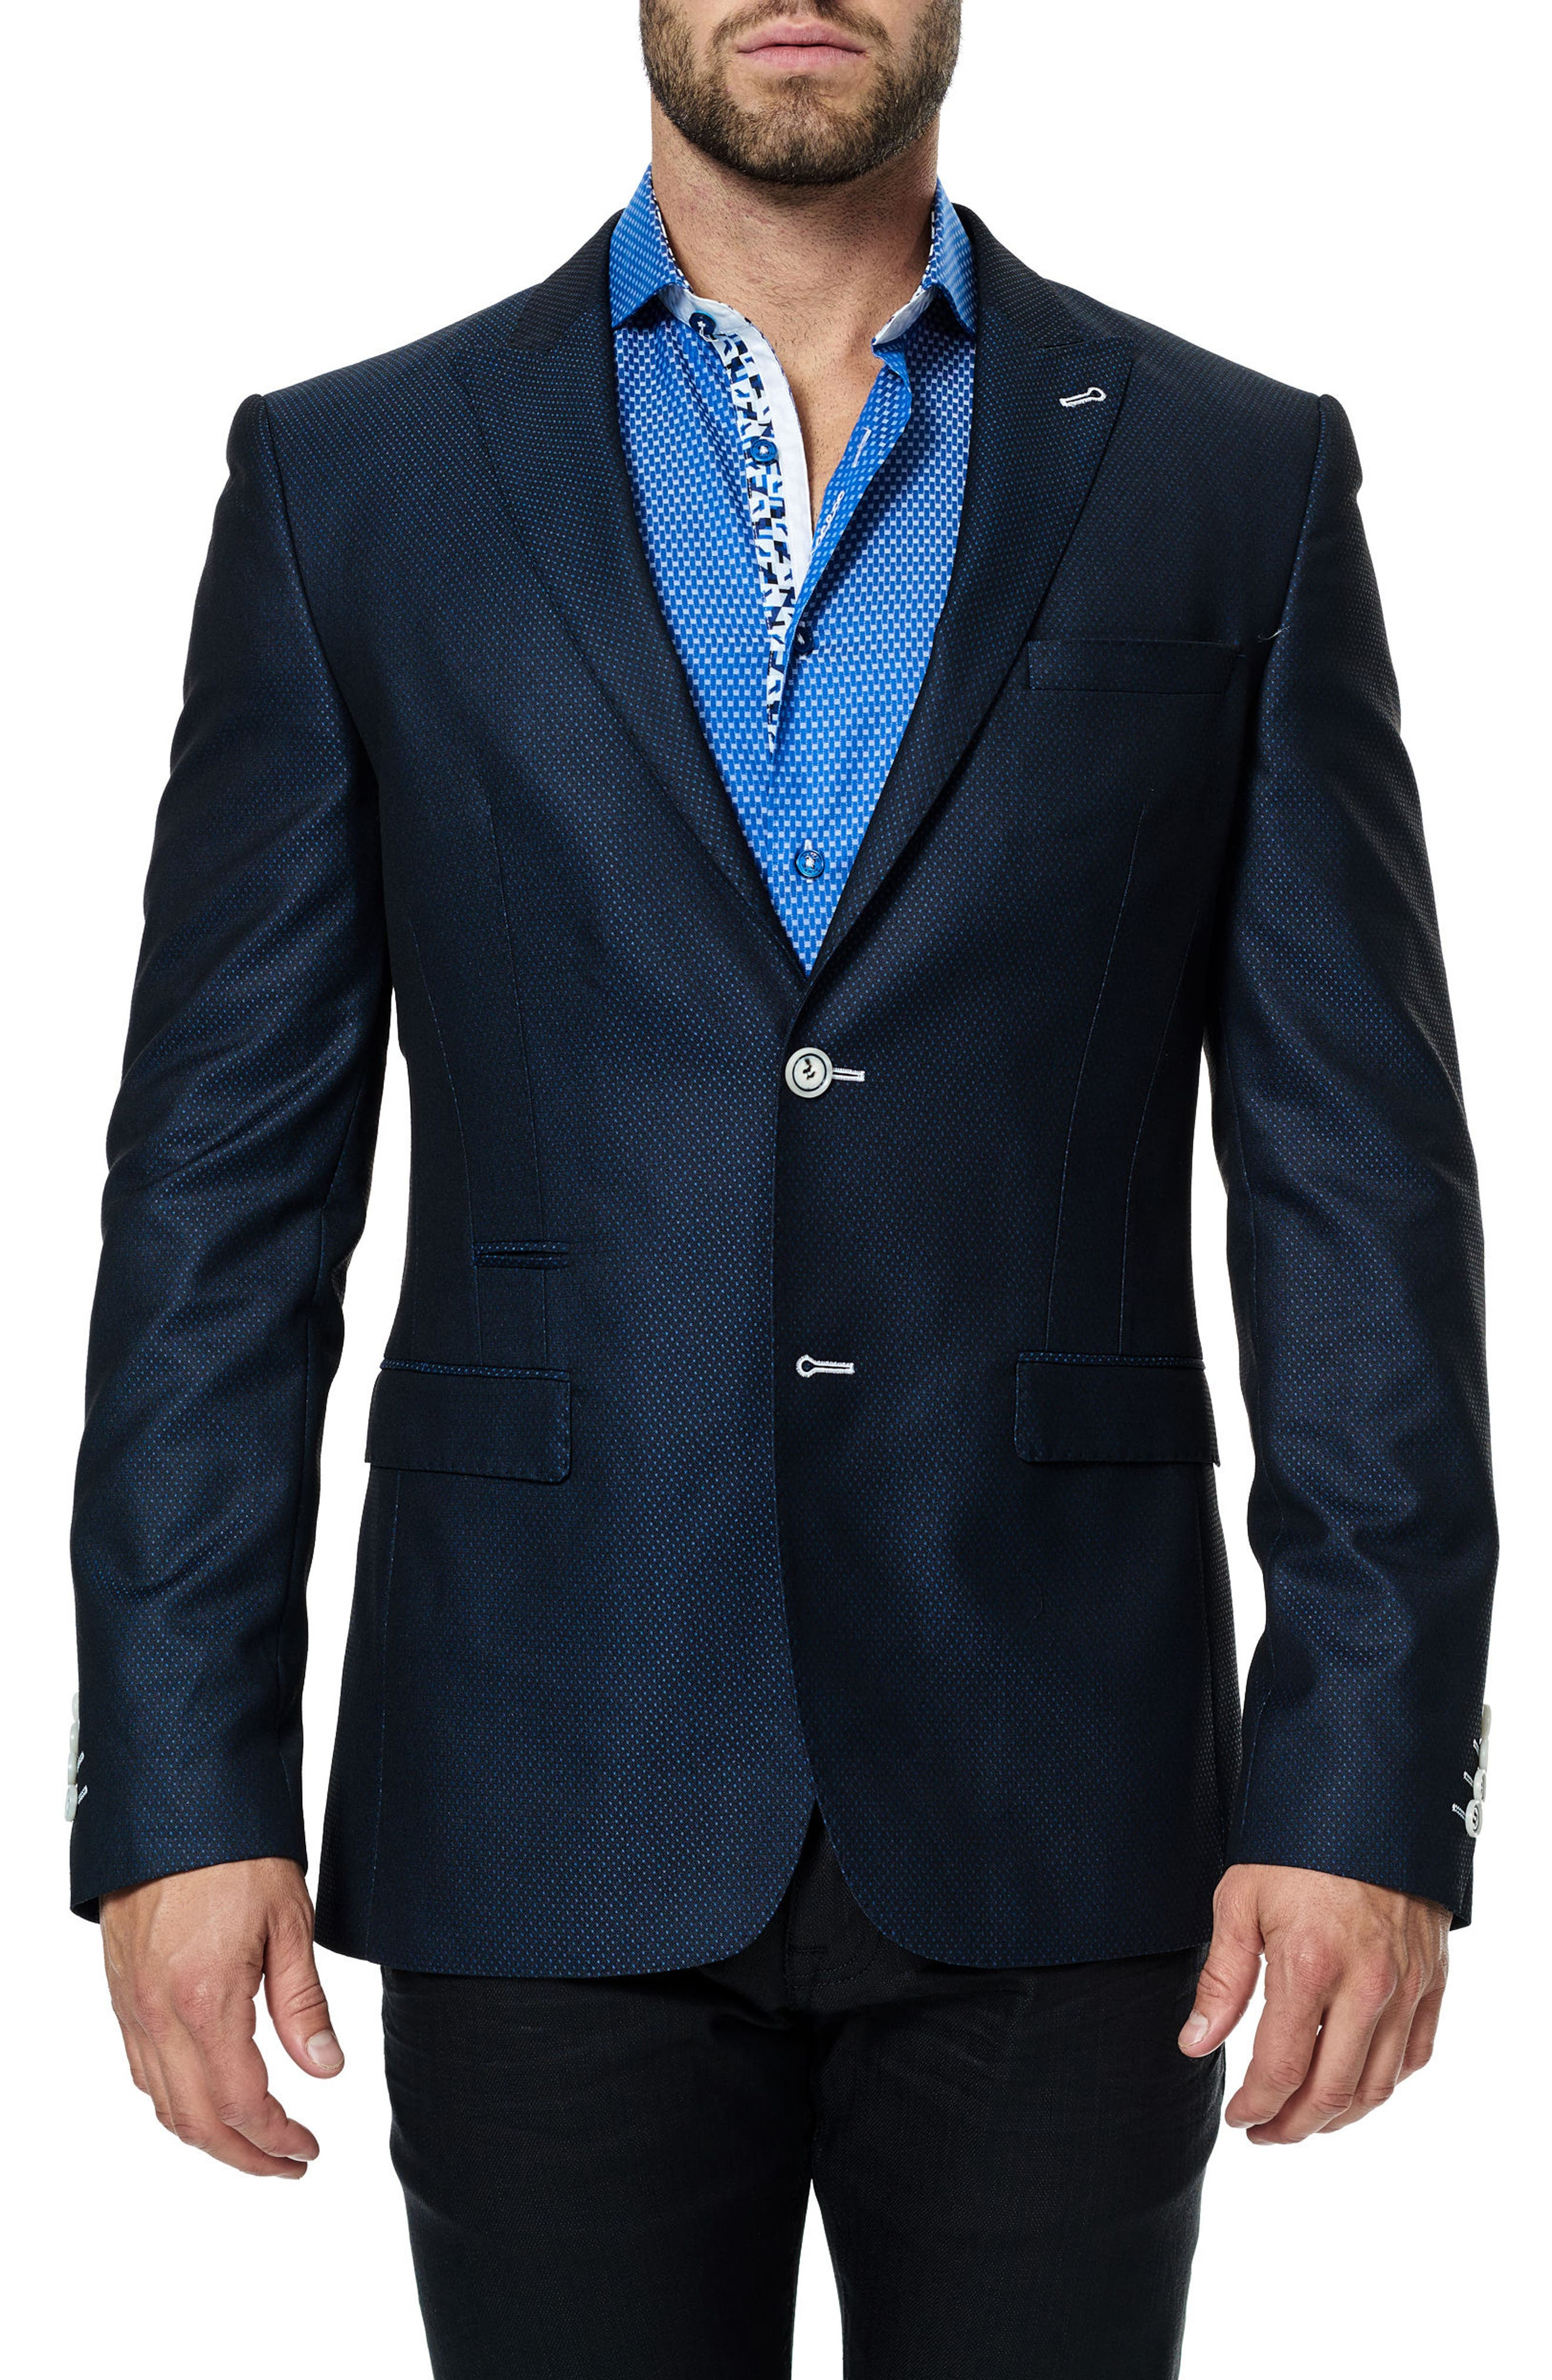 Maceoo Elegance Blue Dot Sport Coat